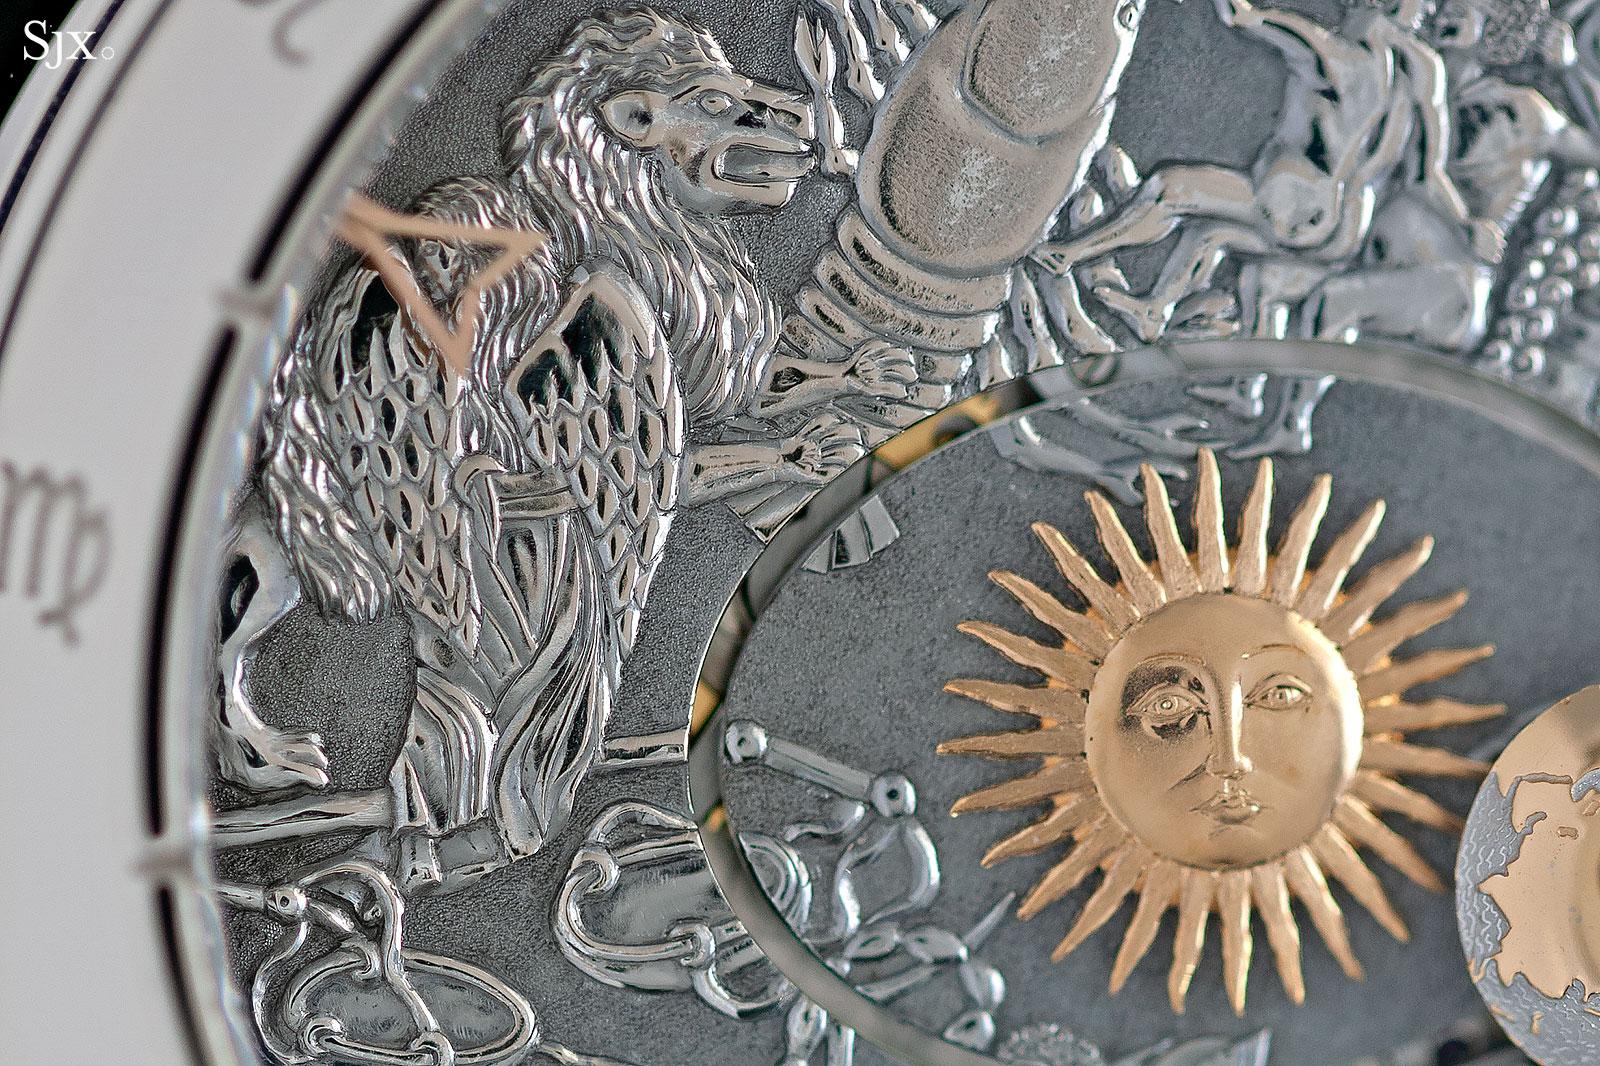 Vacheron Copernicus celestial spheres hand-engraving 5